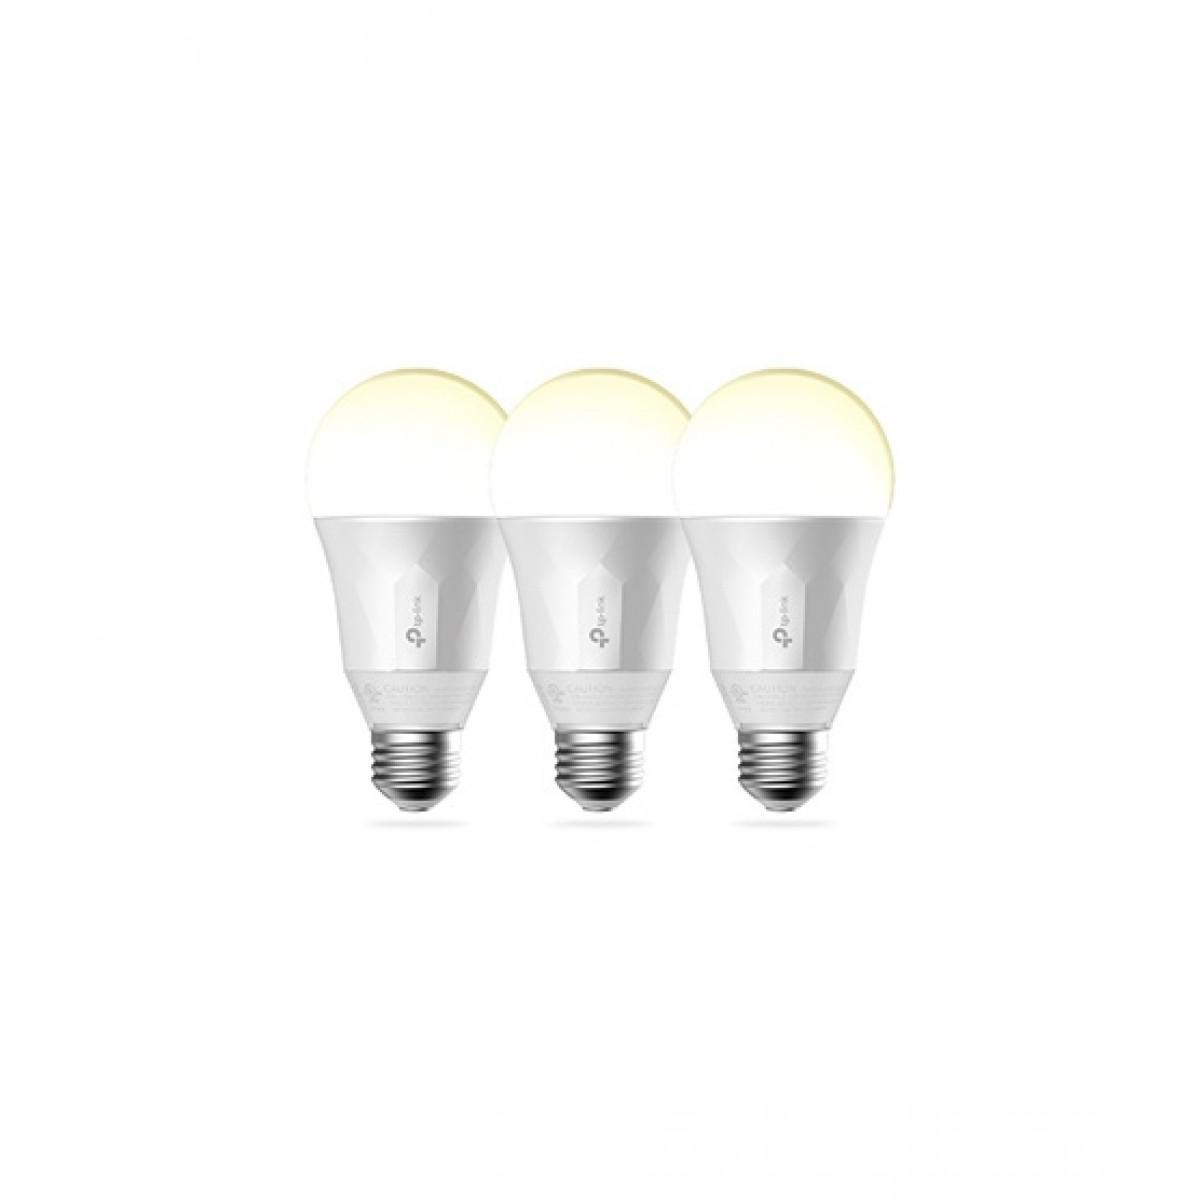 da2640f02 TP-Link Smart Wi-Fi Led Bulb 3-Pack (LB100 TKIT) Price in Pakistan ...